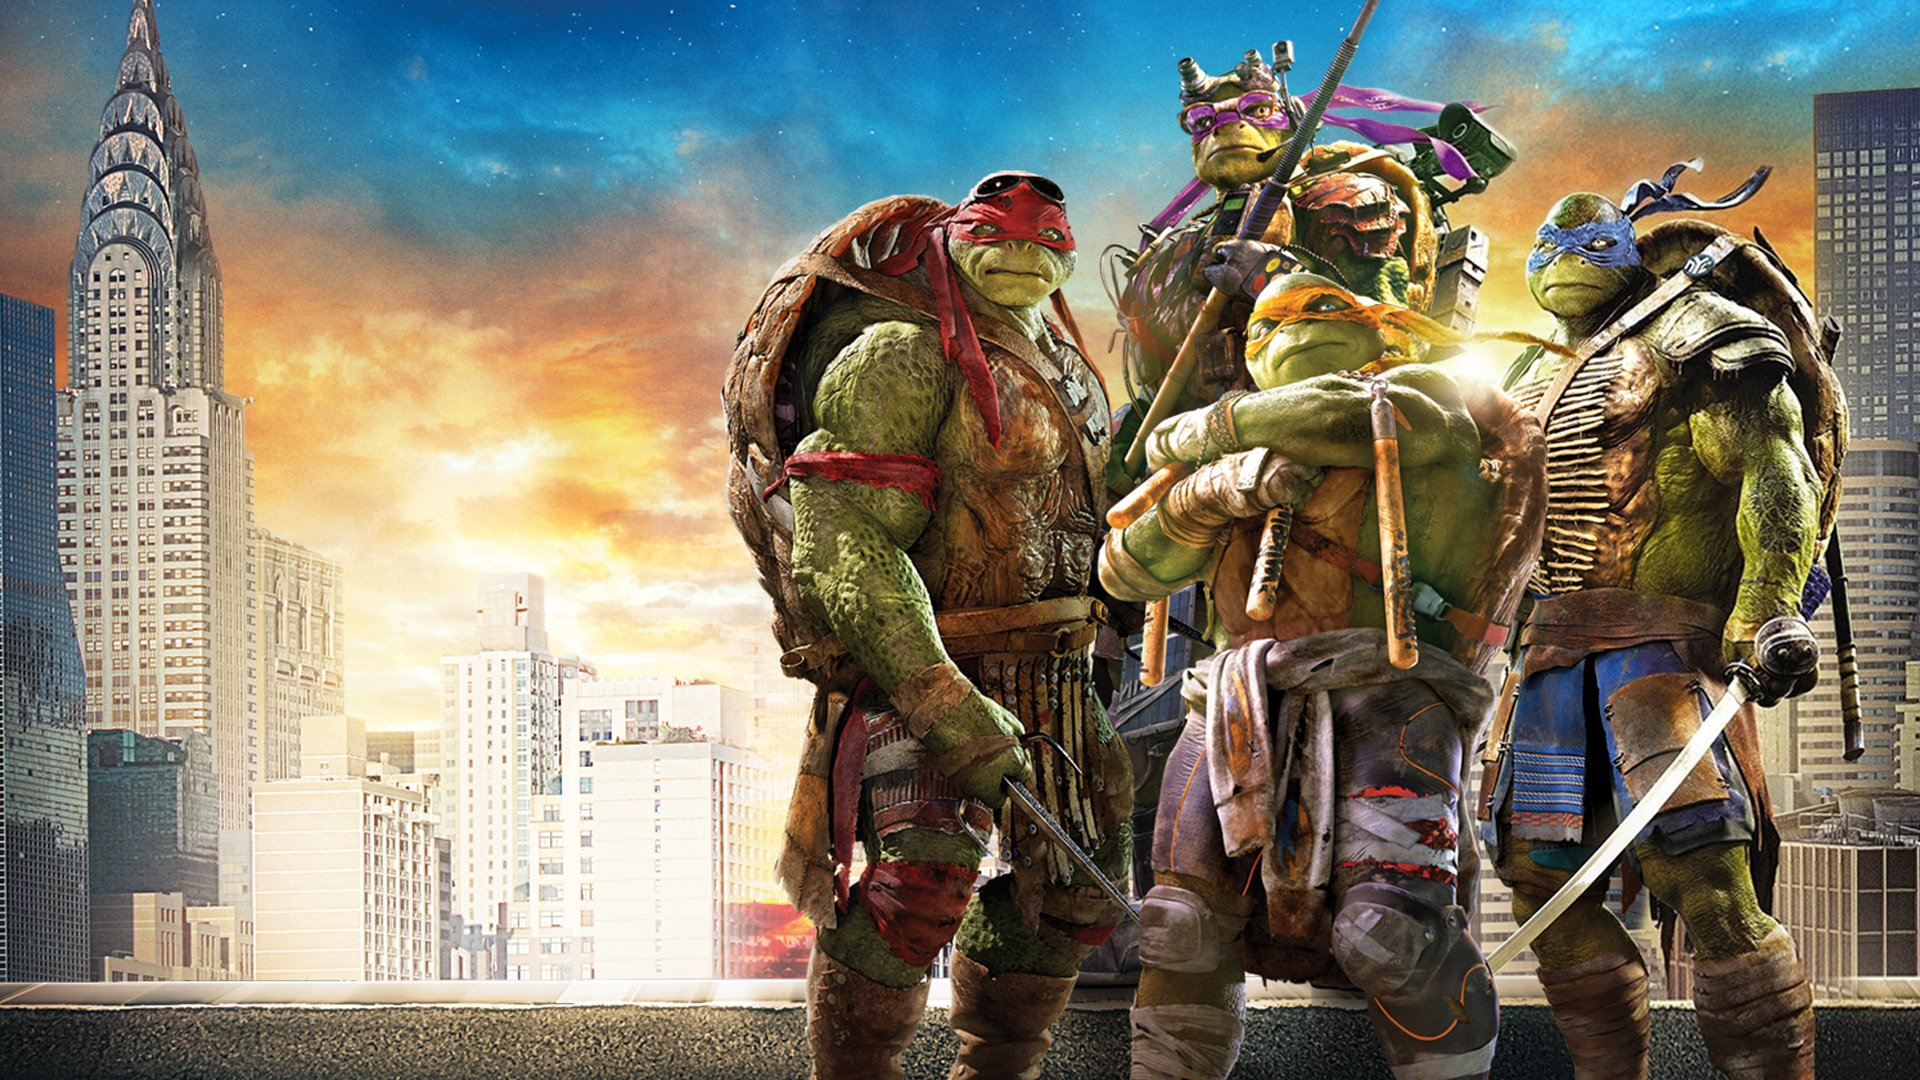 Teenage mutant ninja turtles hd wallpaper background image 1920x1080 id 674417 wallpaper - Ninja turtles wallpaper ...